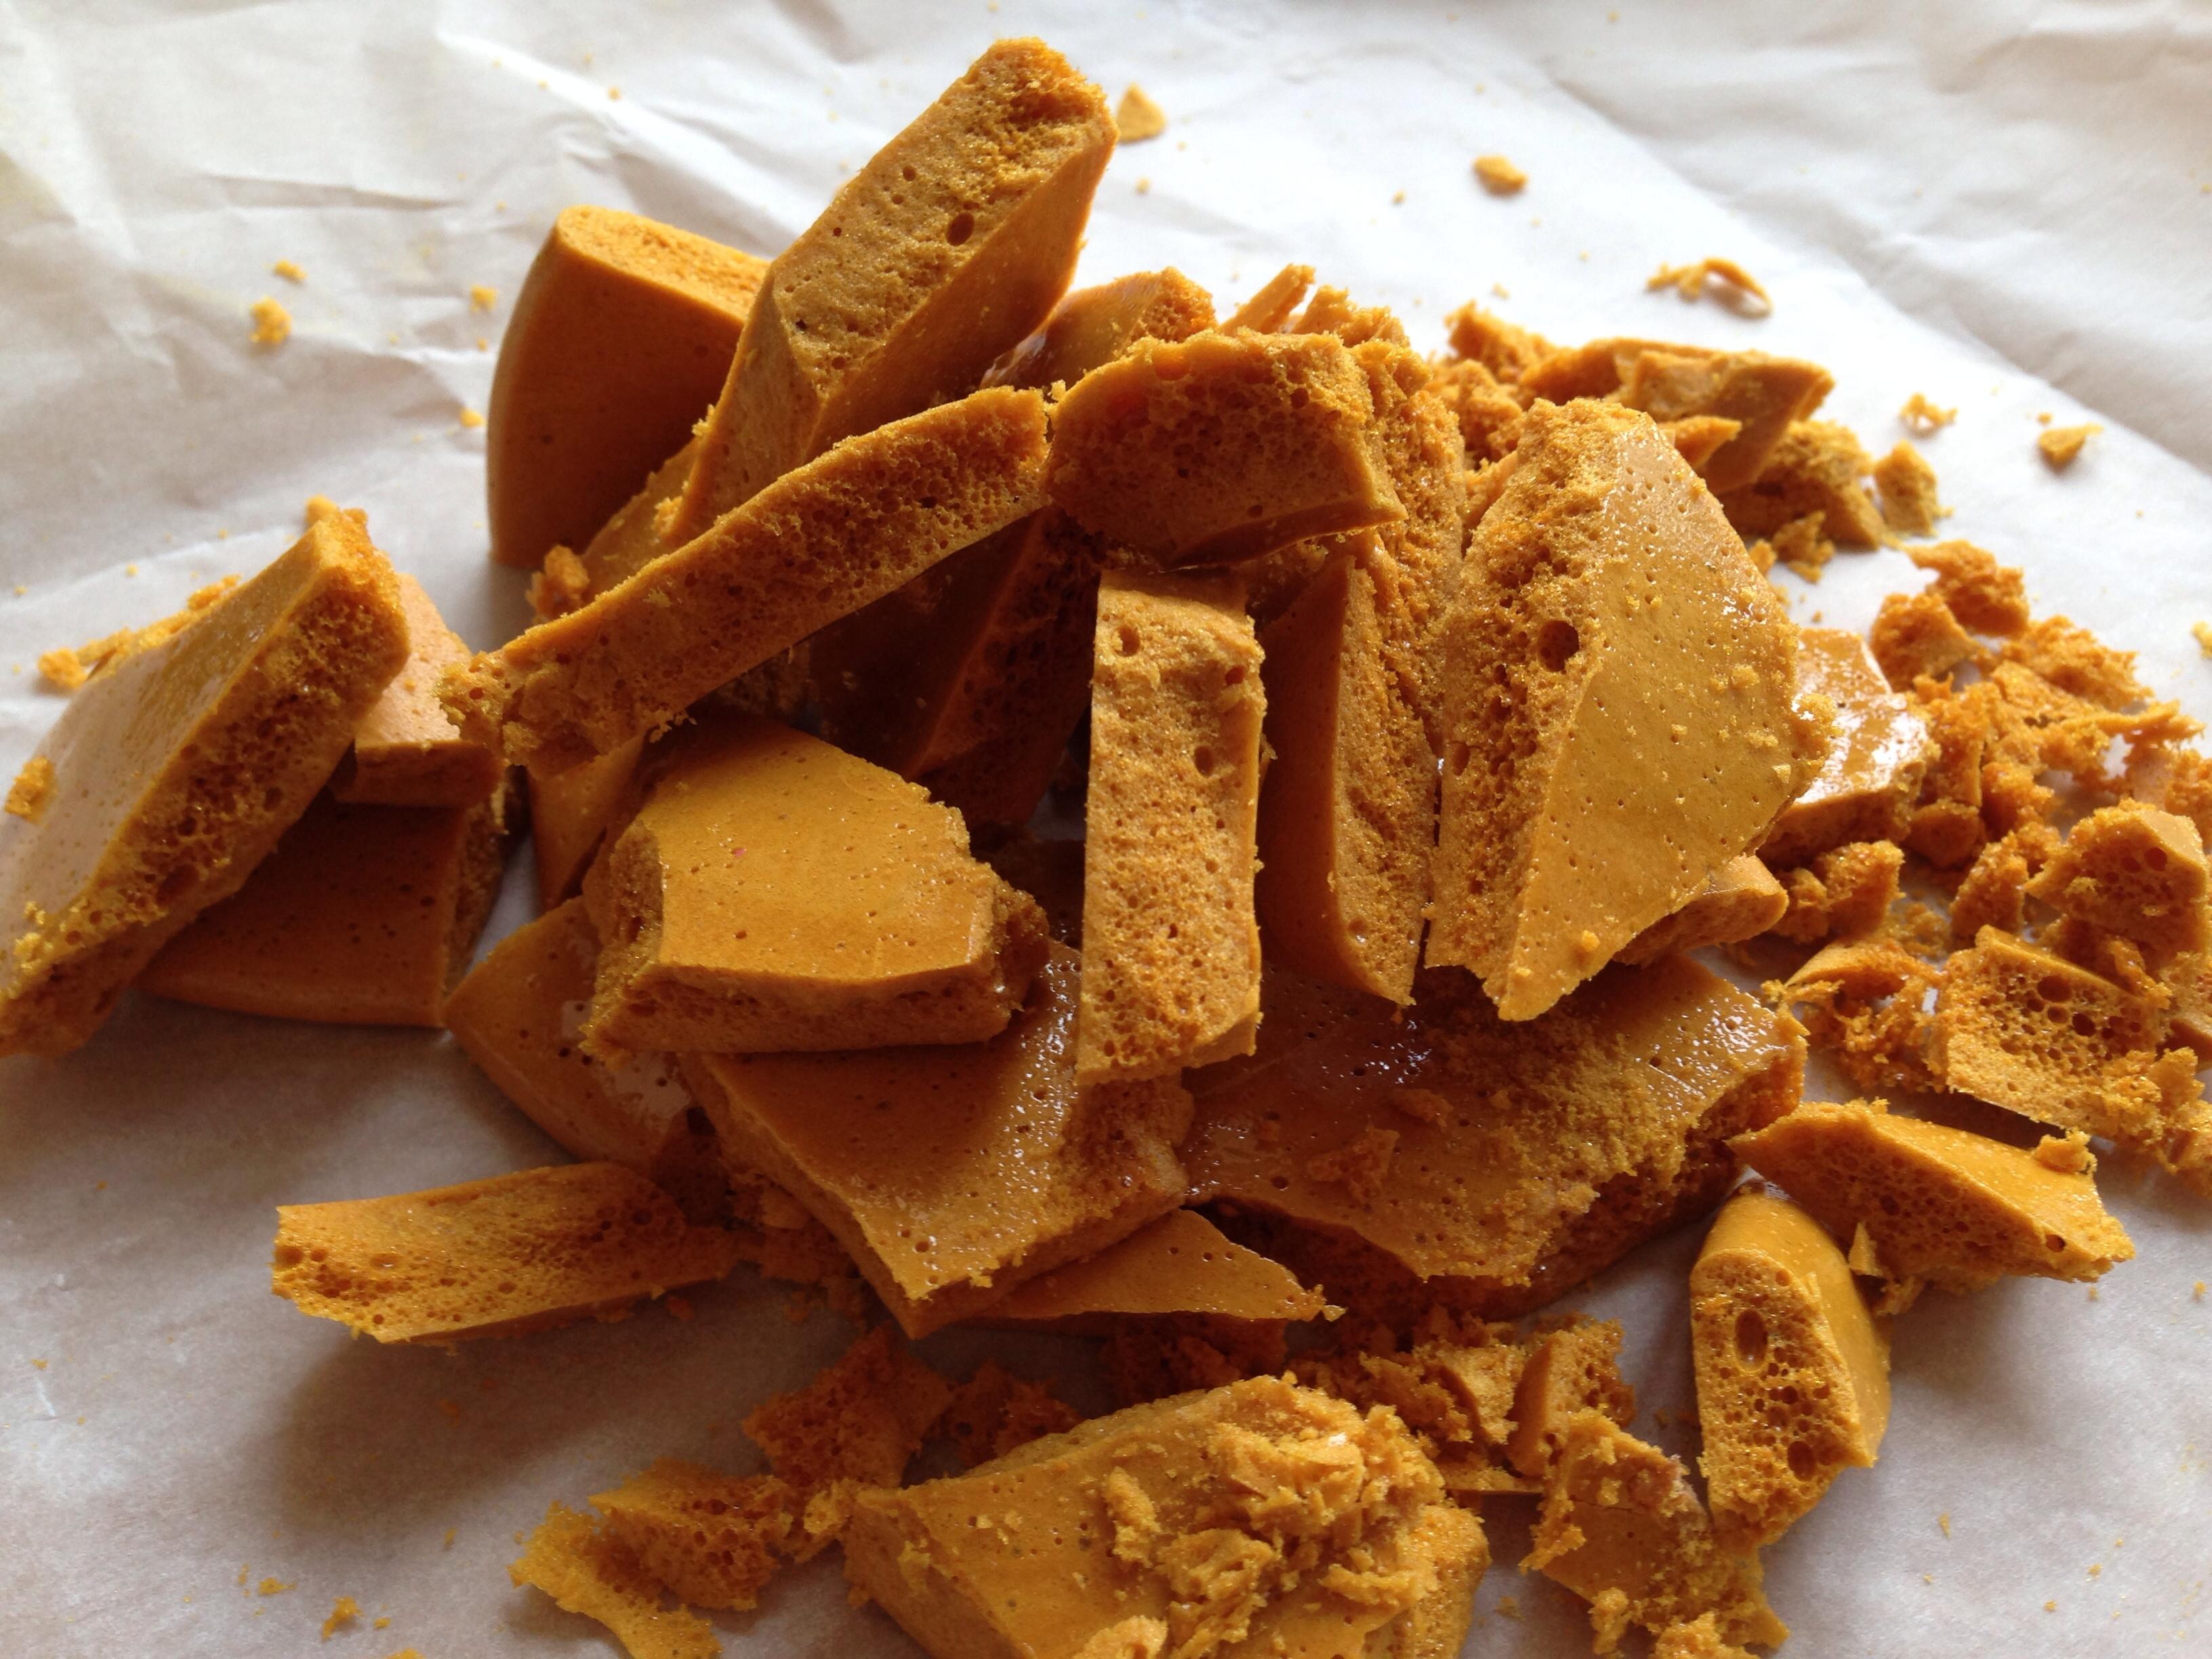 shards of honeycomb